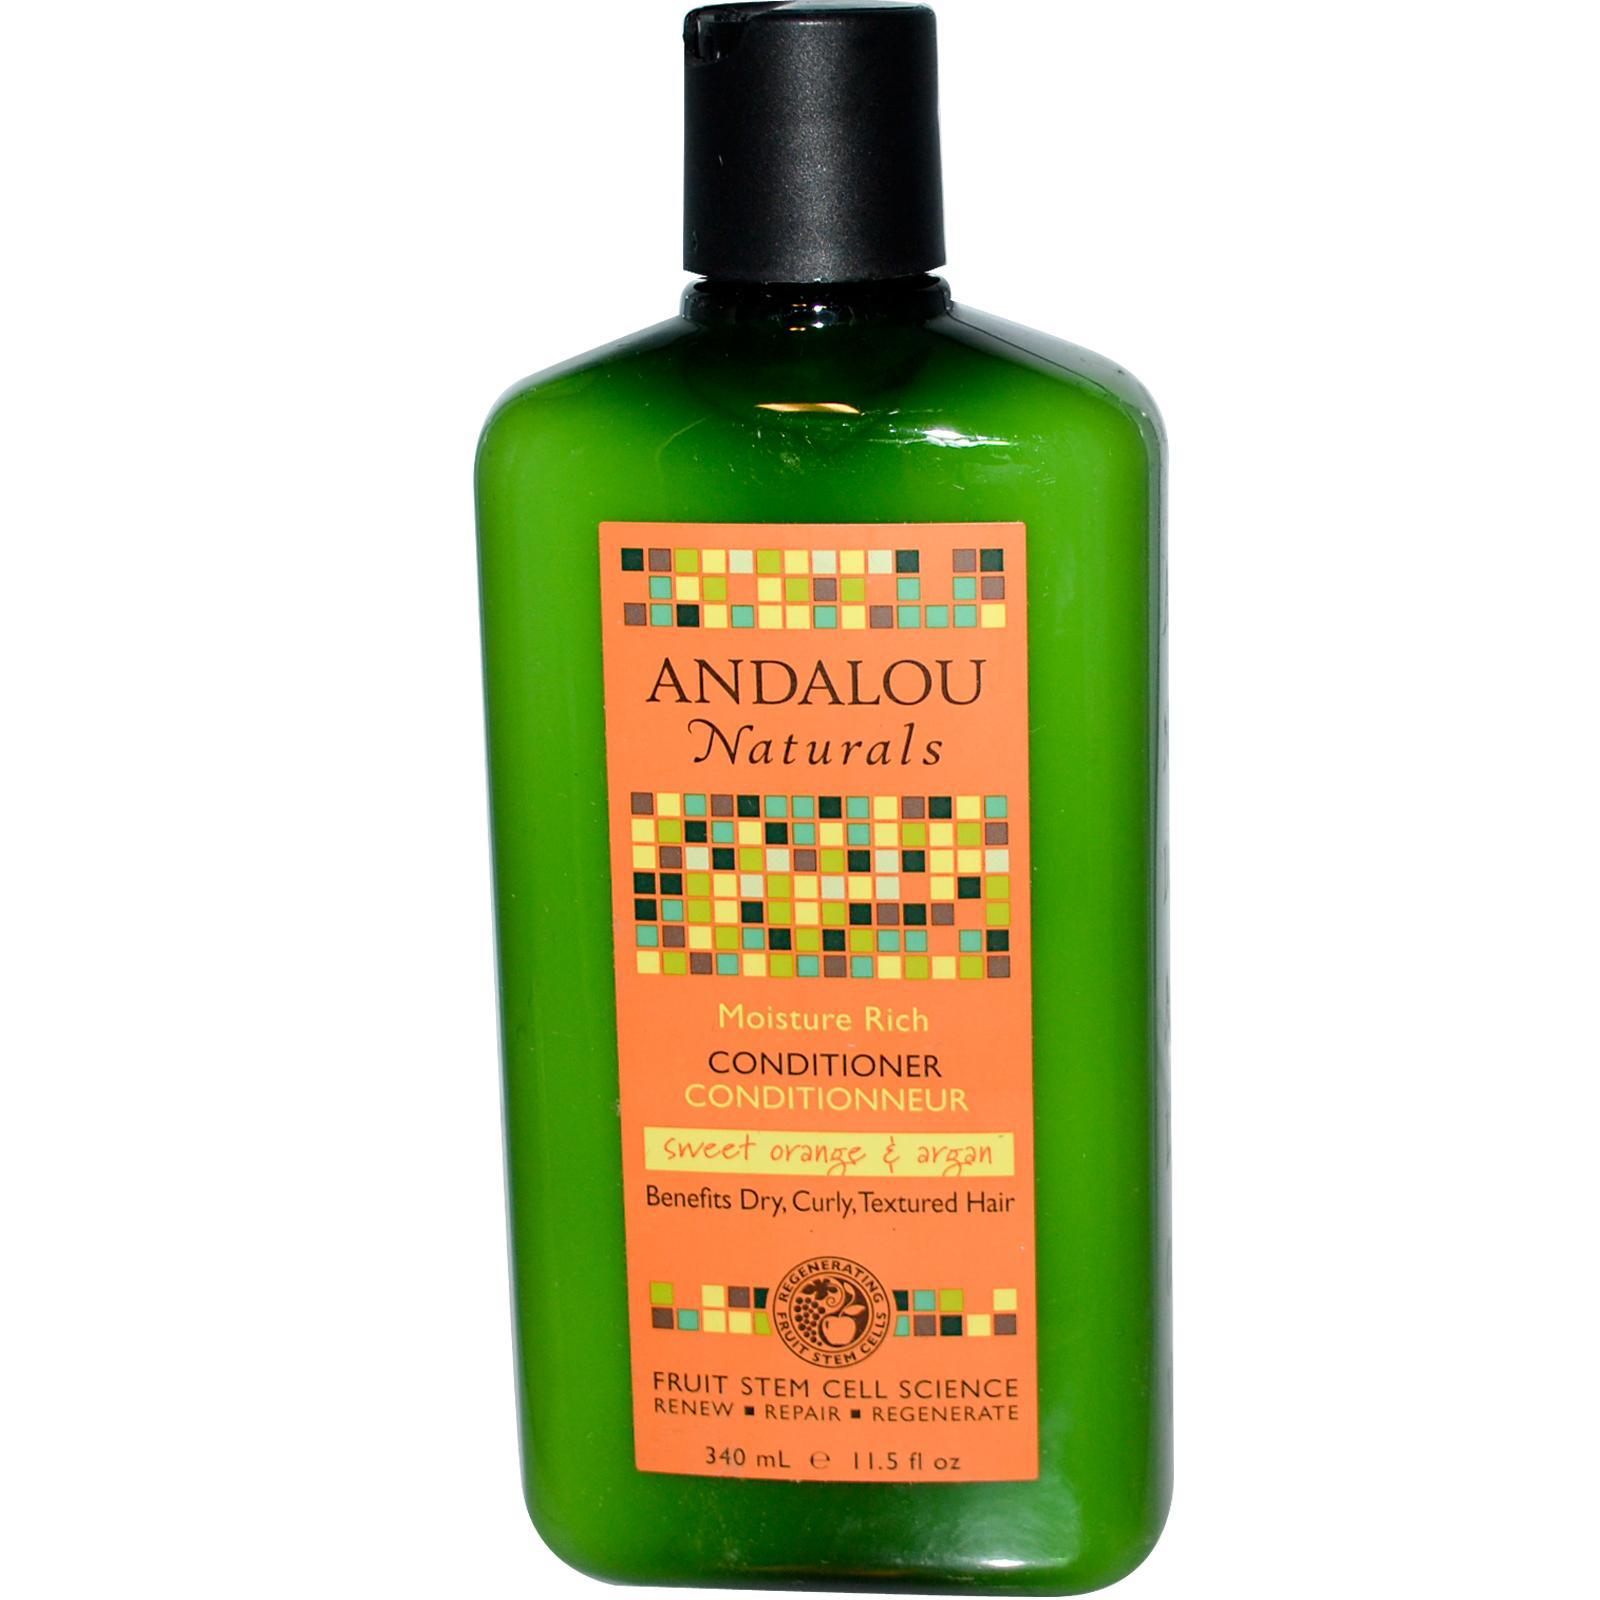 Andalou Naturals Moisture Rich Sweet Orange & Argan Conditioner (1x11.5 Oz)